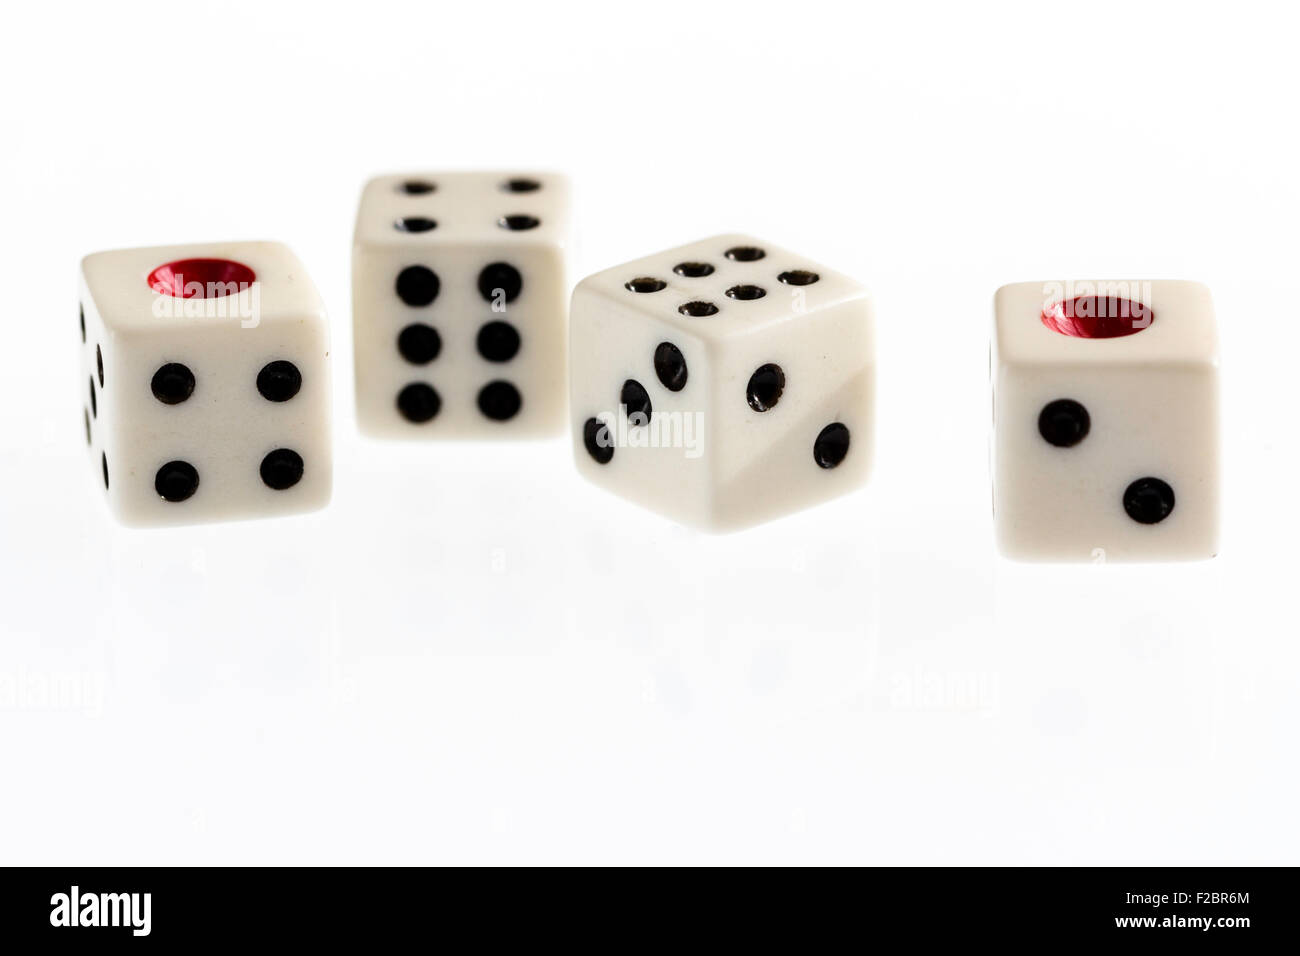 Four dice on plain background` - Stock Image